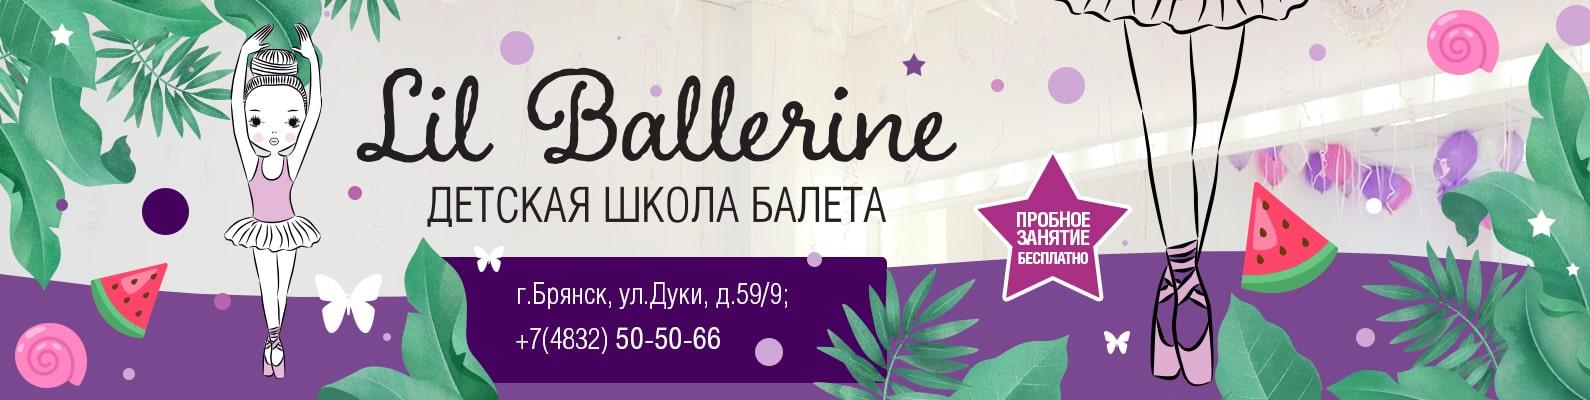 Группа ВК Lil Ballerine